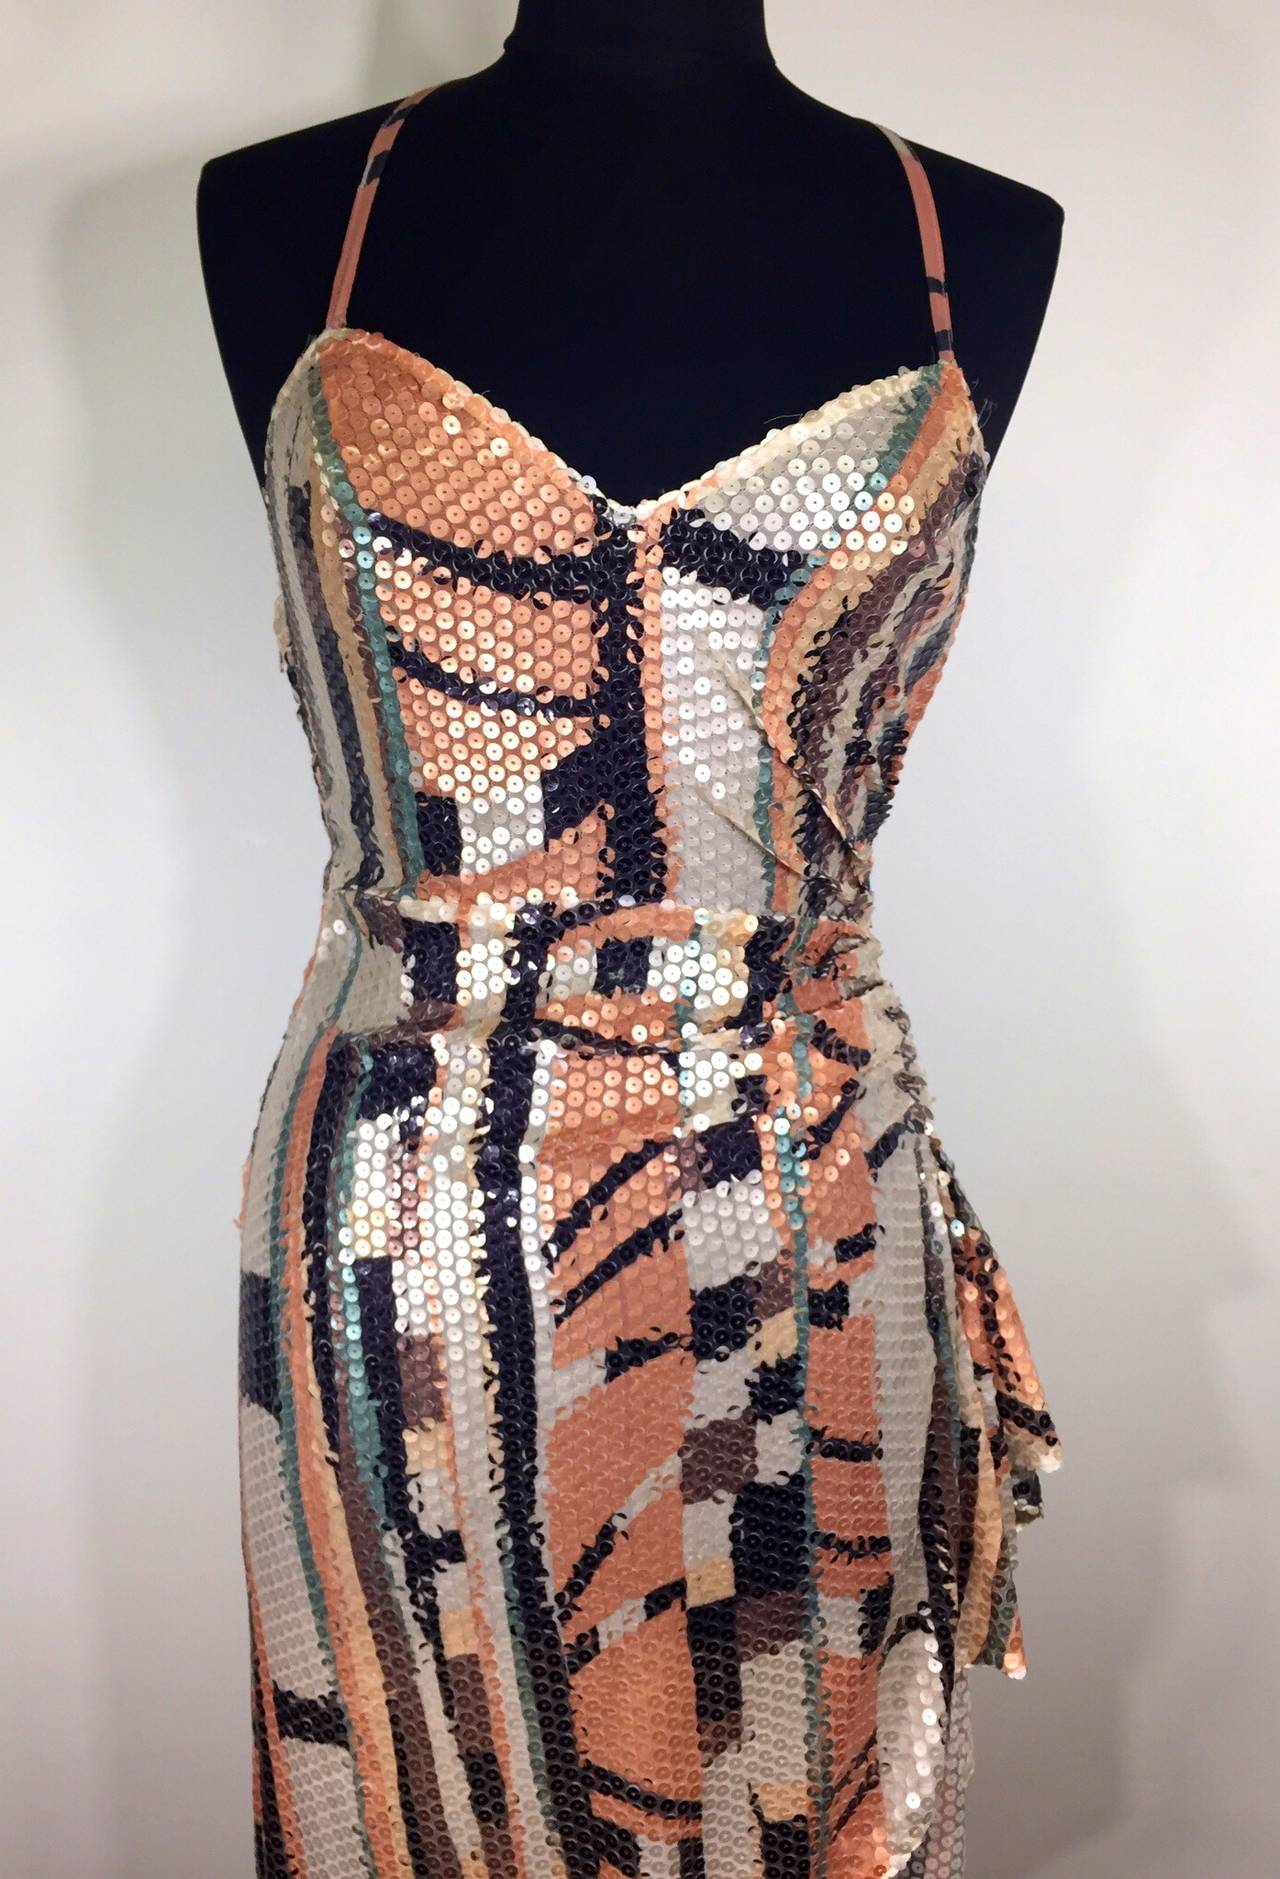 70s Disco Dresses  Shop for 70s Disco Dresses on Polyvore